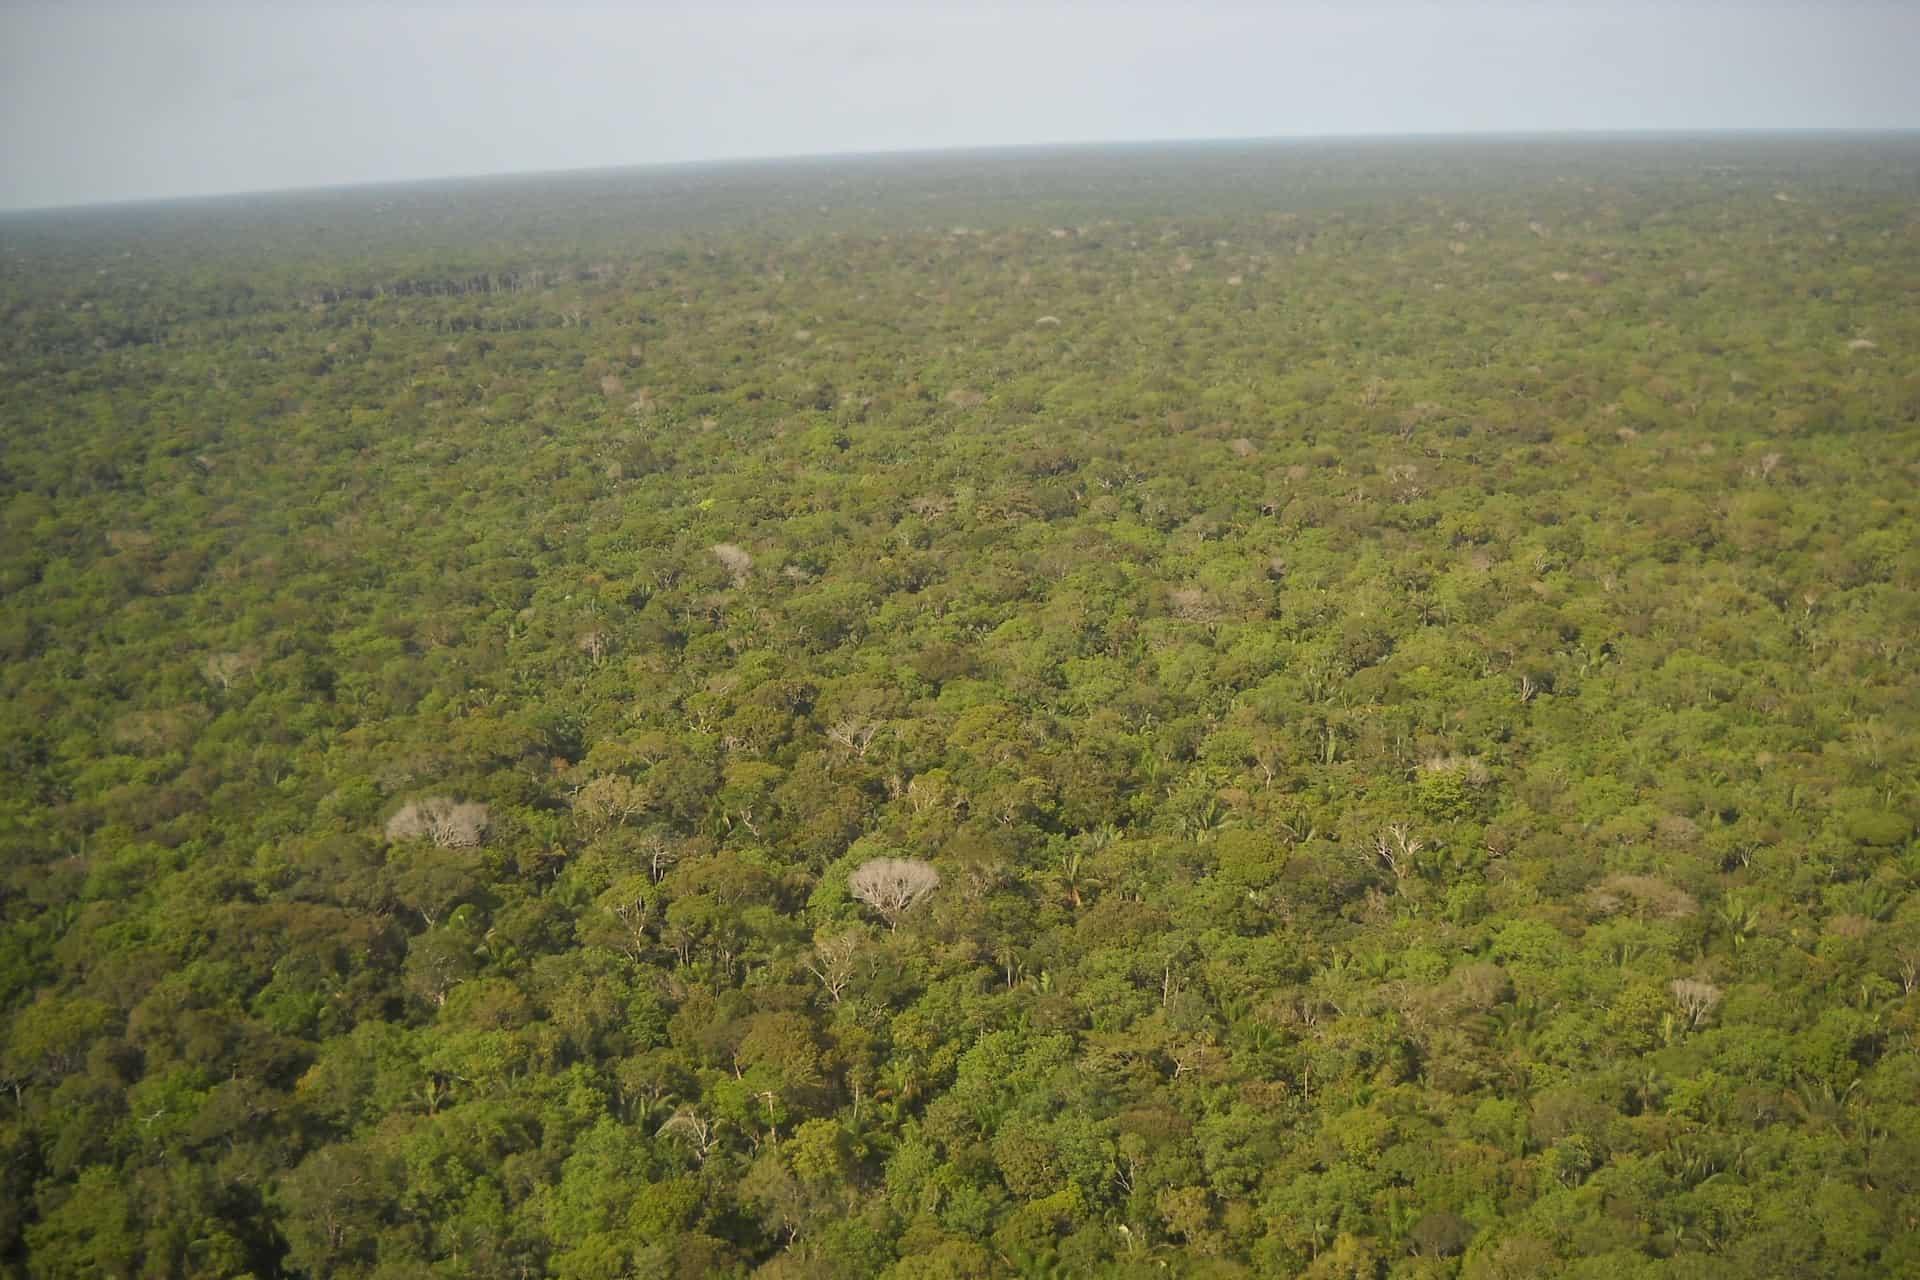 Floresta Amazônica - Sequestro de Carbono